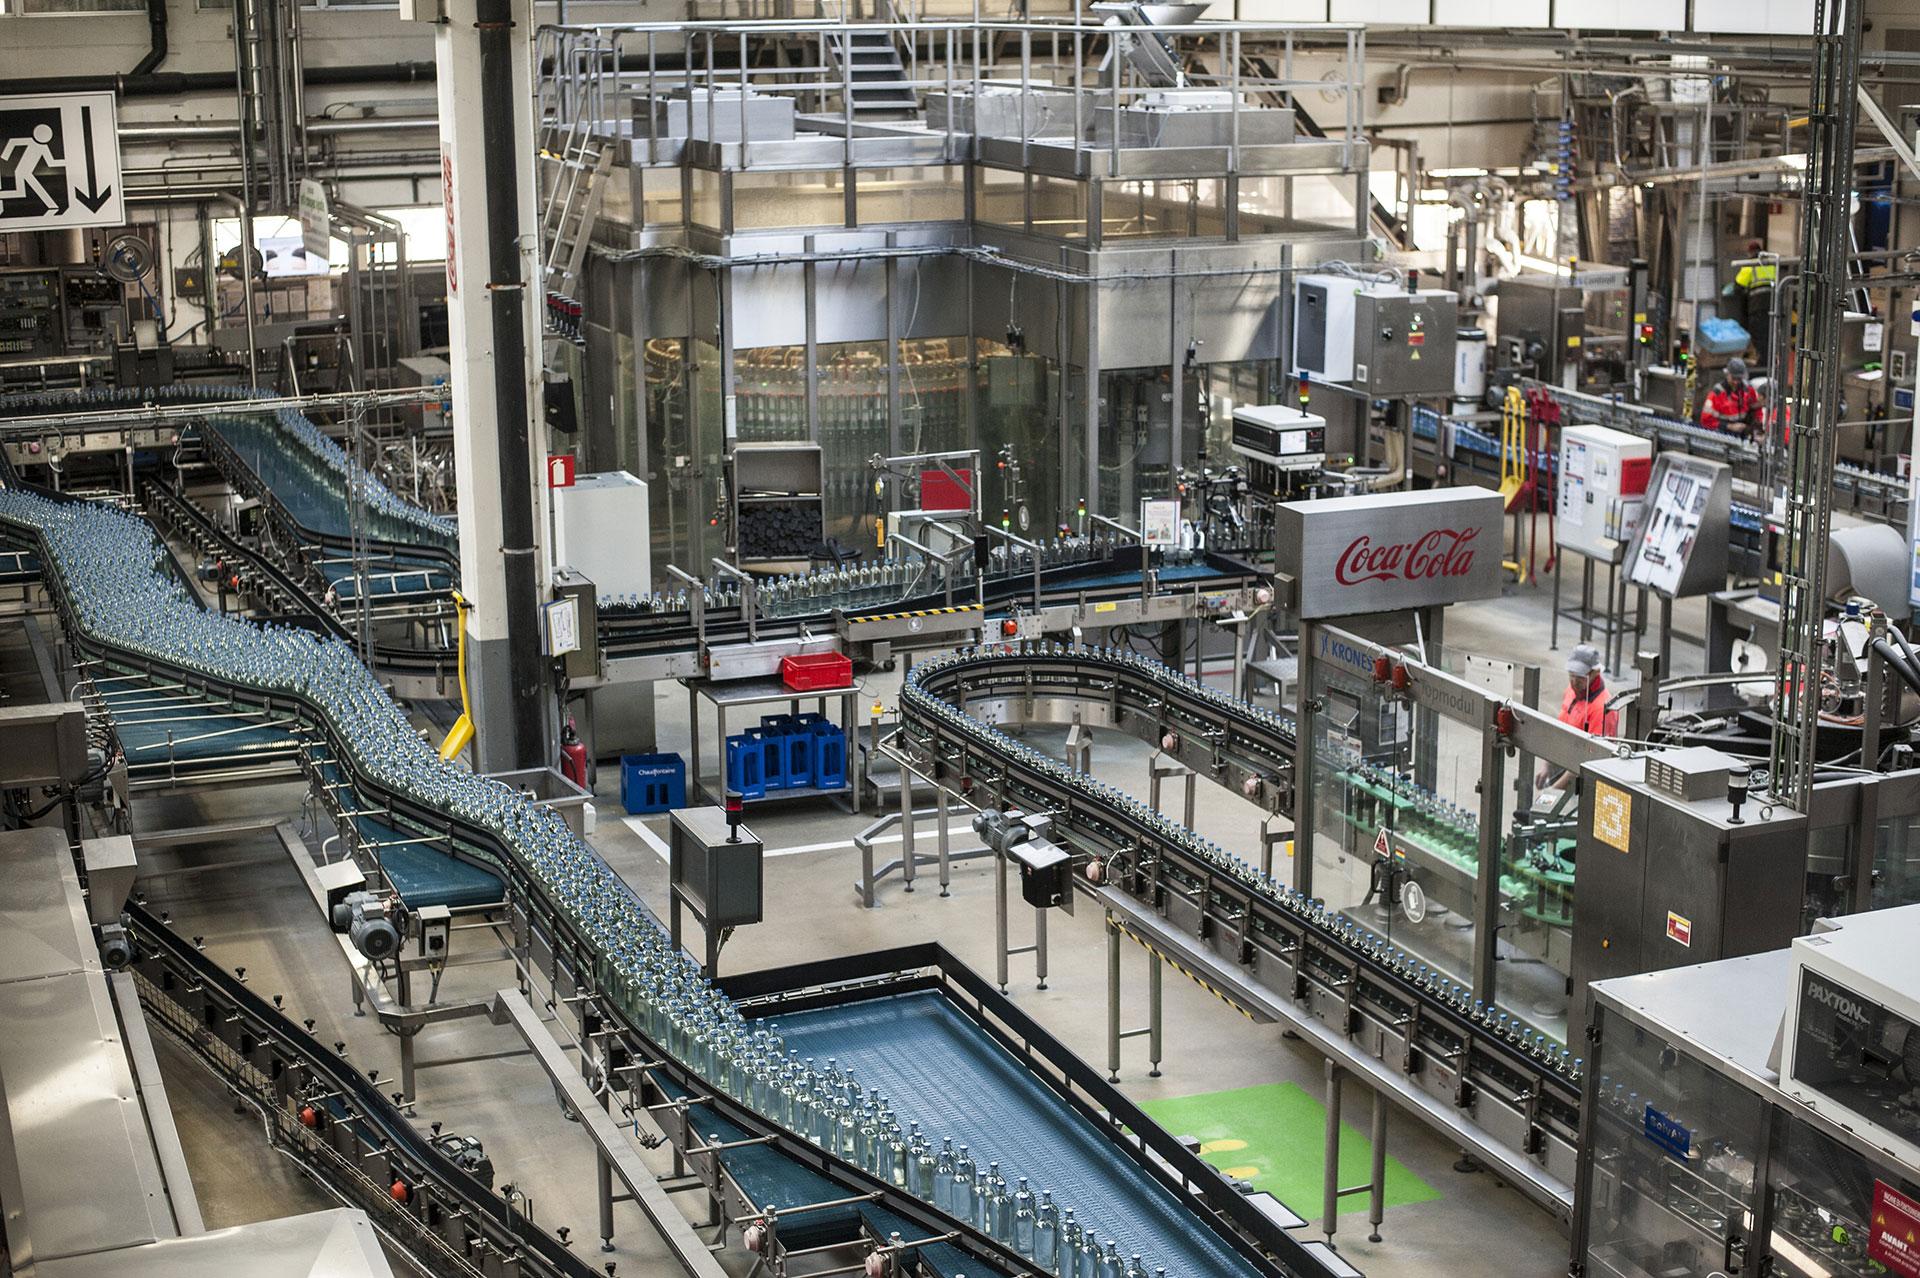 Waterhouse - usine - coca-cola - chaudfontaine